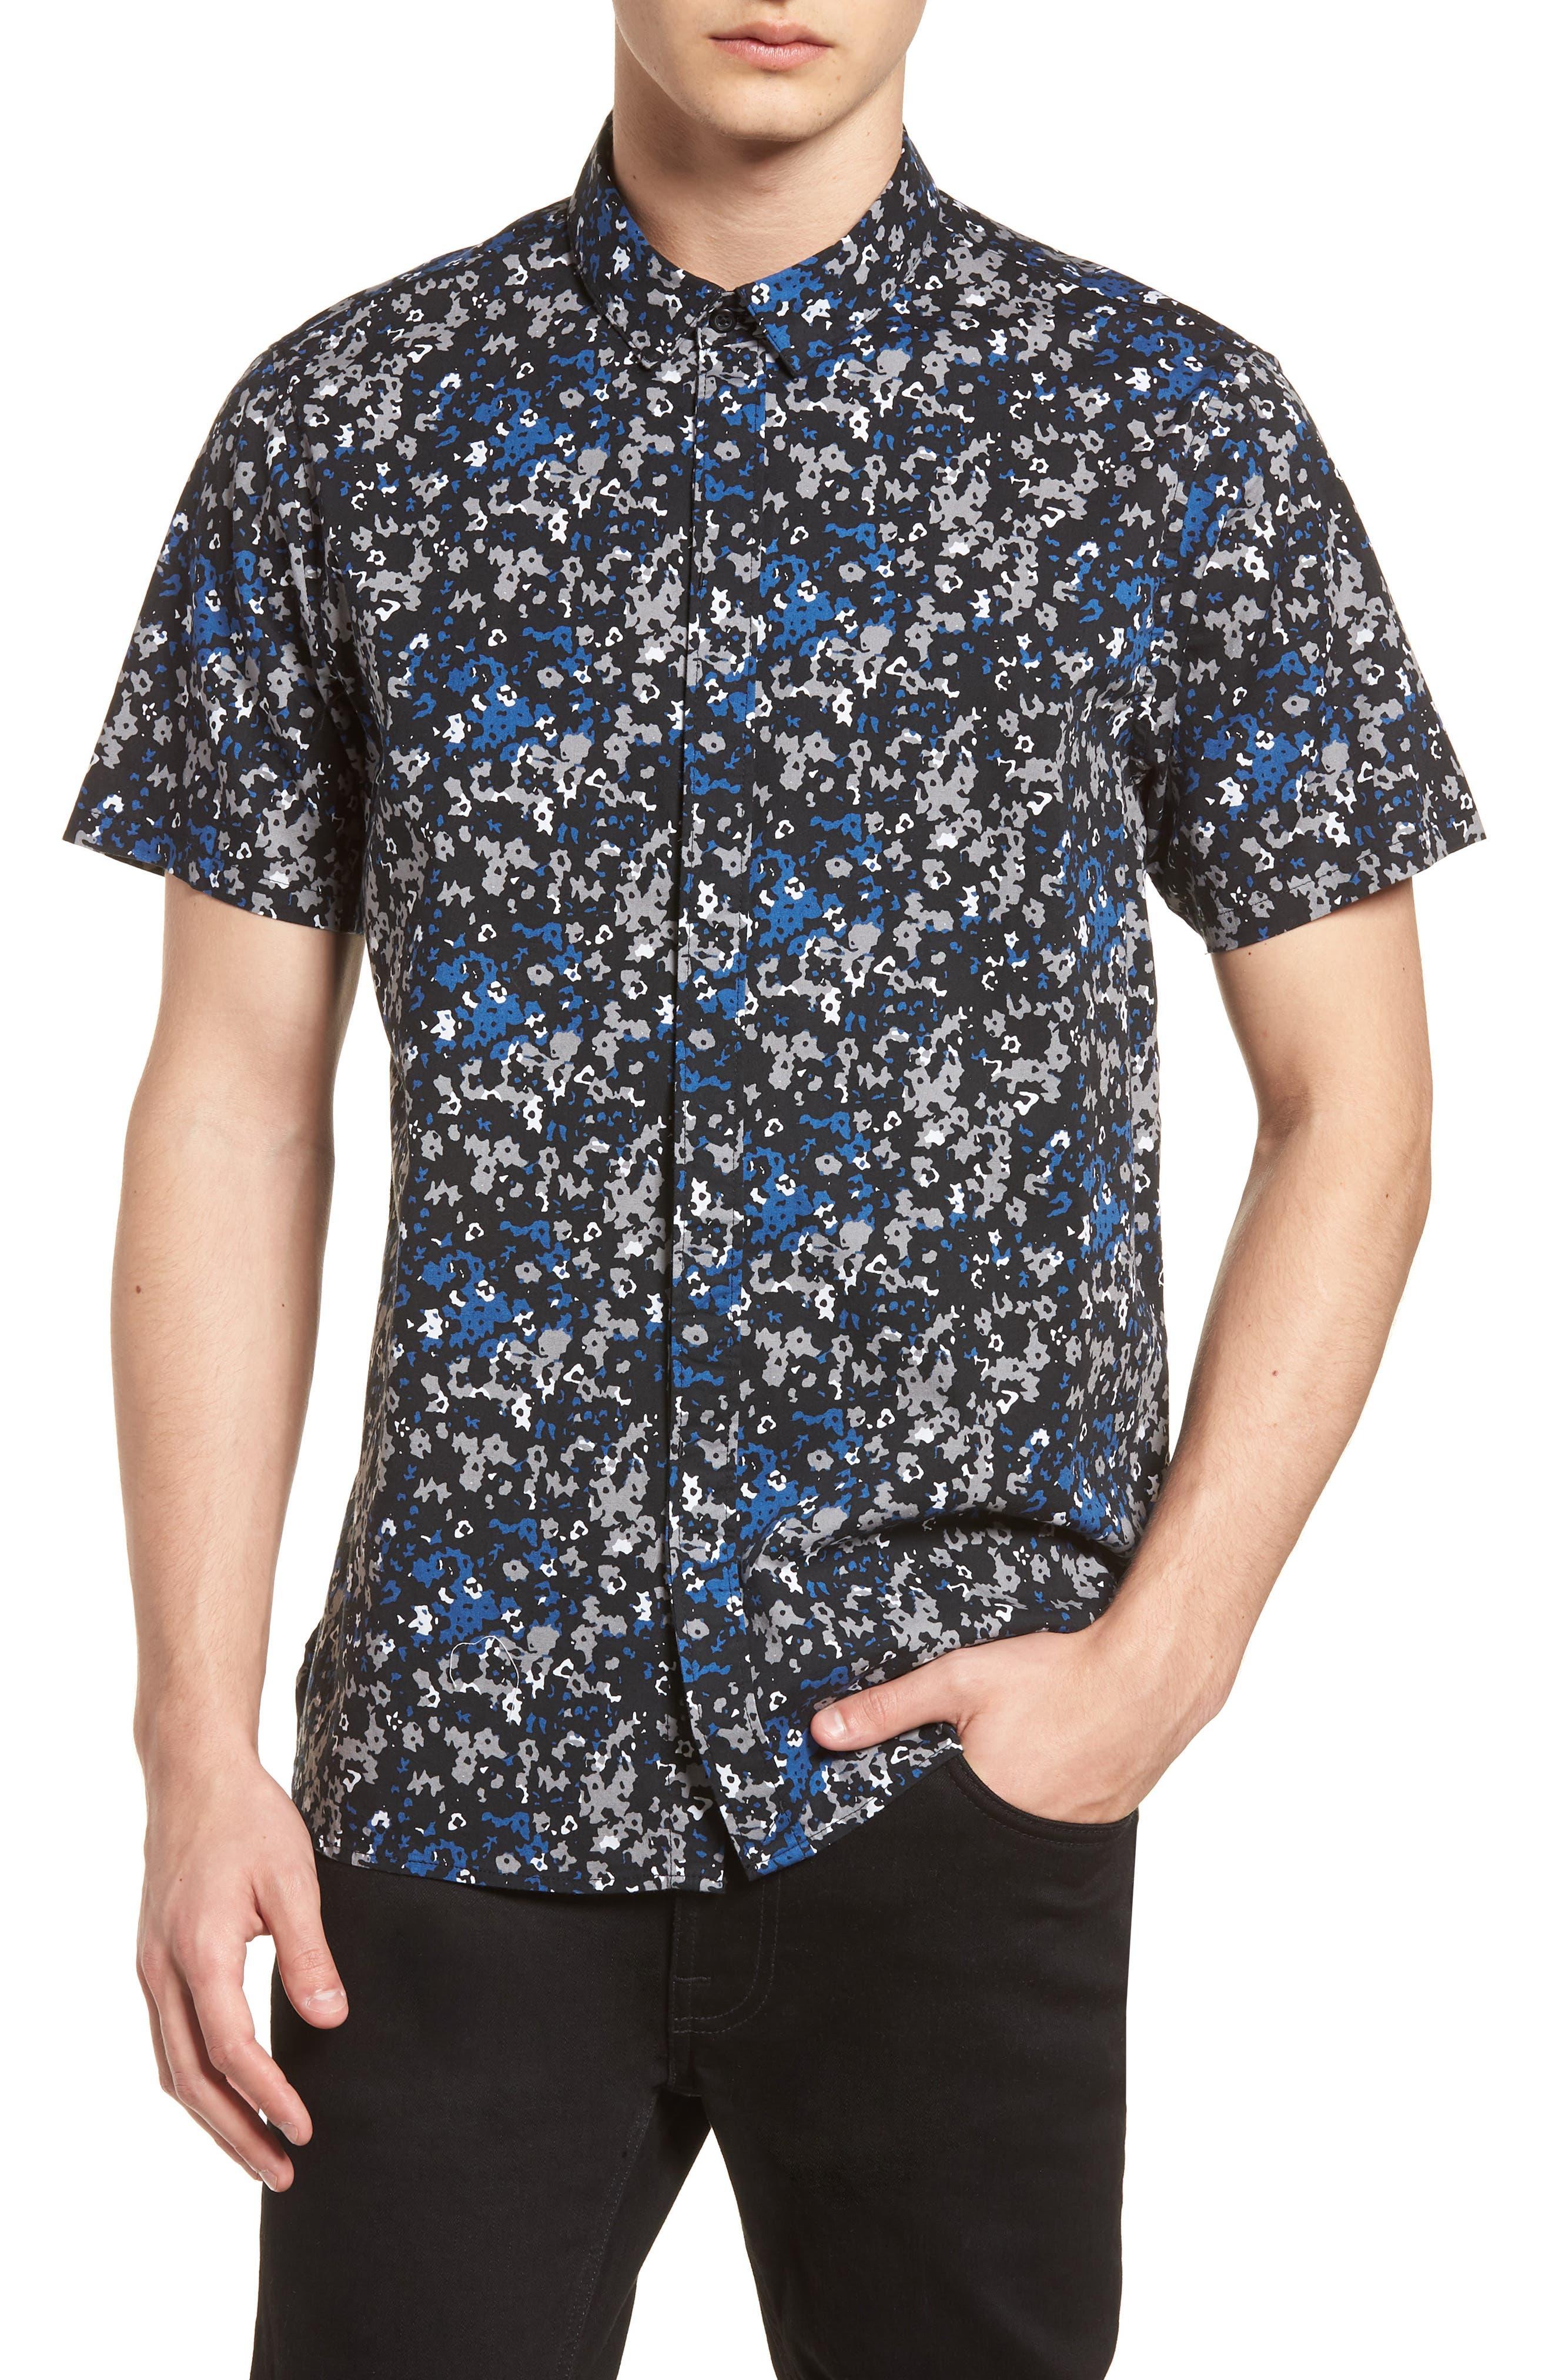 Fowler Woven Shirt,                             Main thumbnail 1, color,                             BLACK MICRO FLORAL